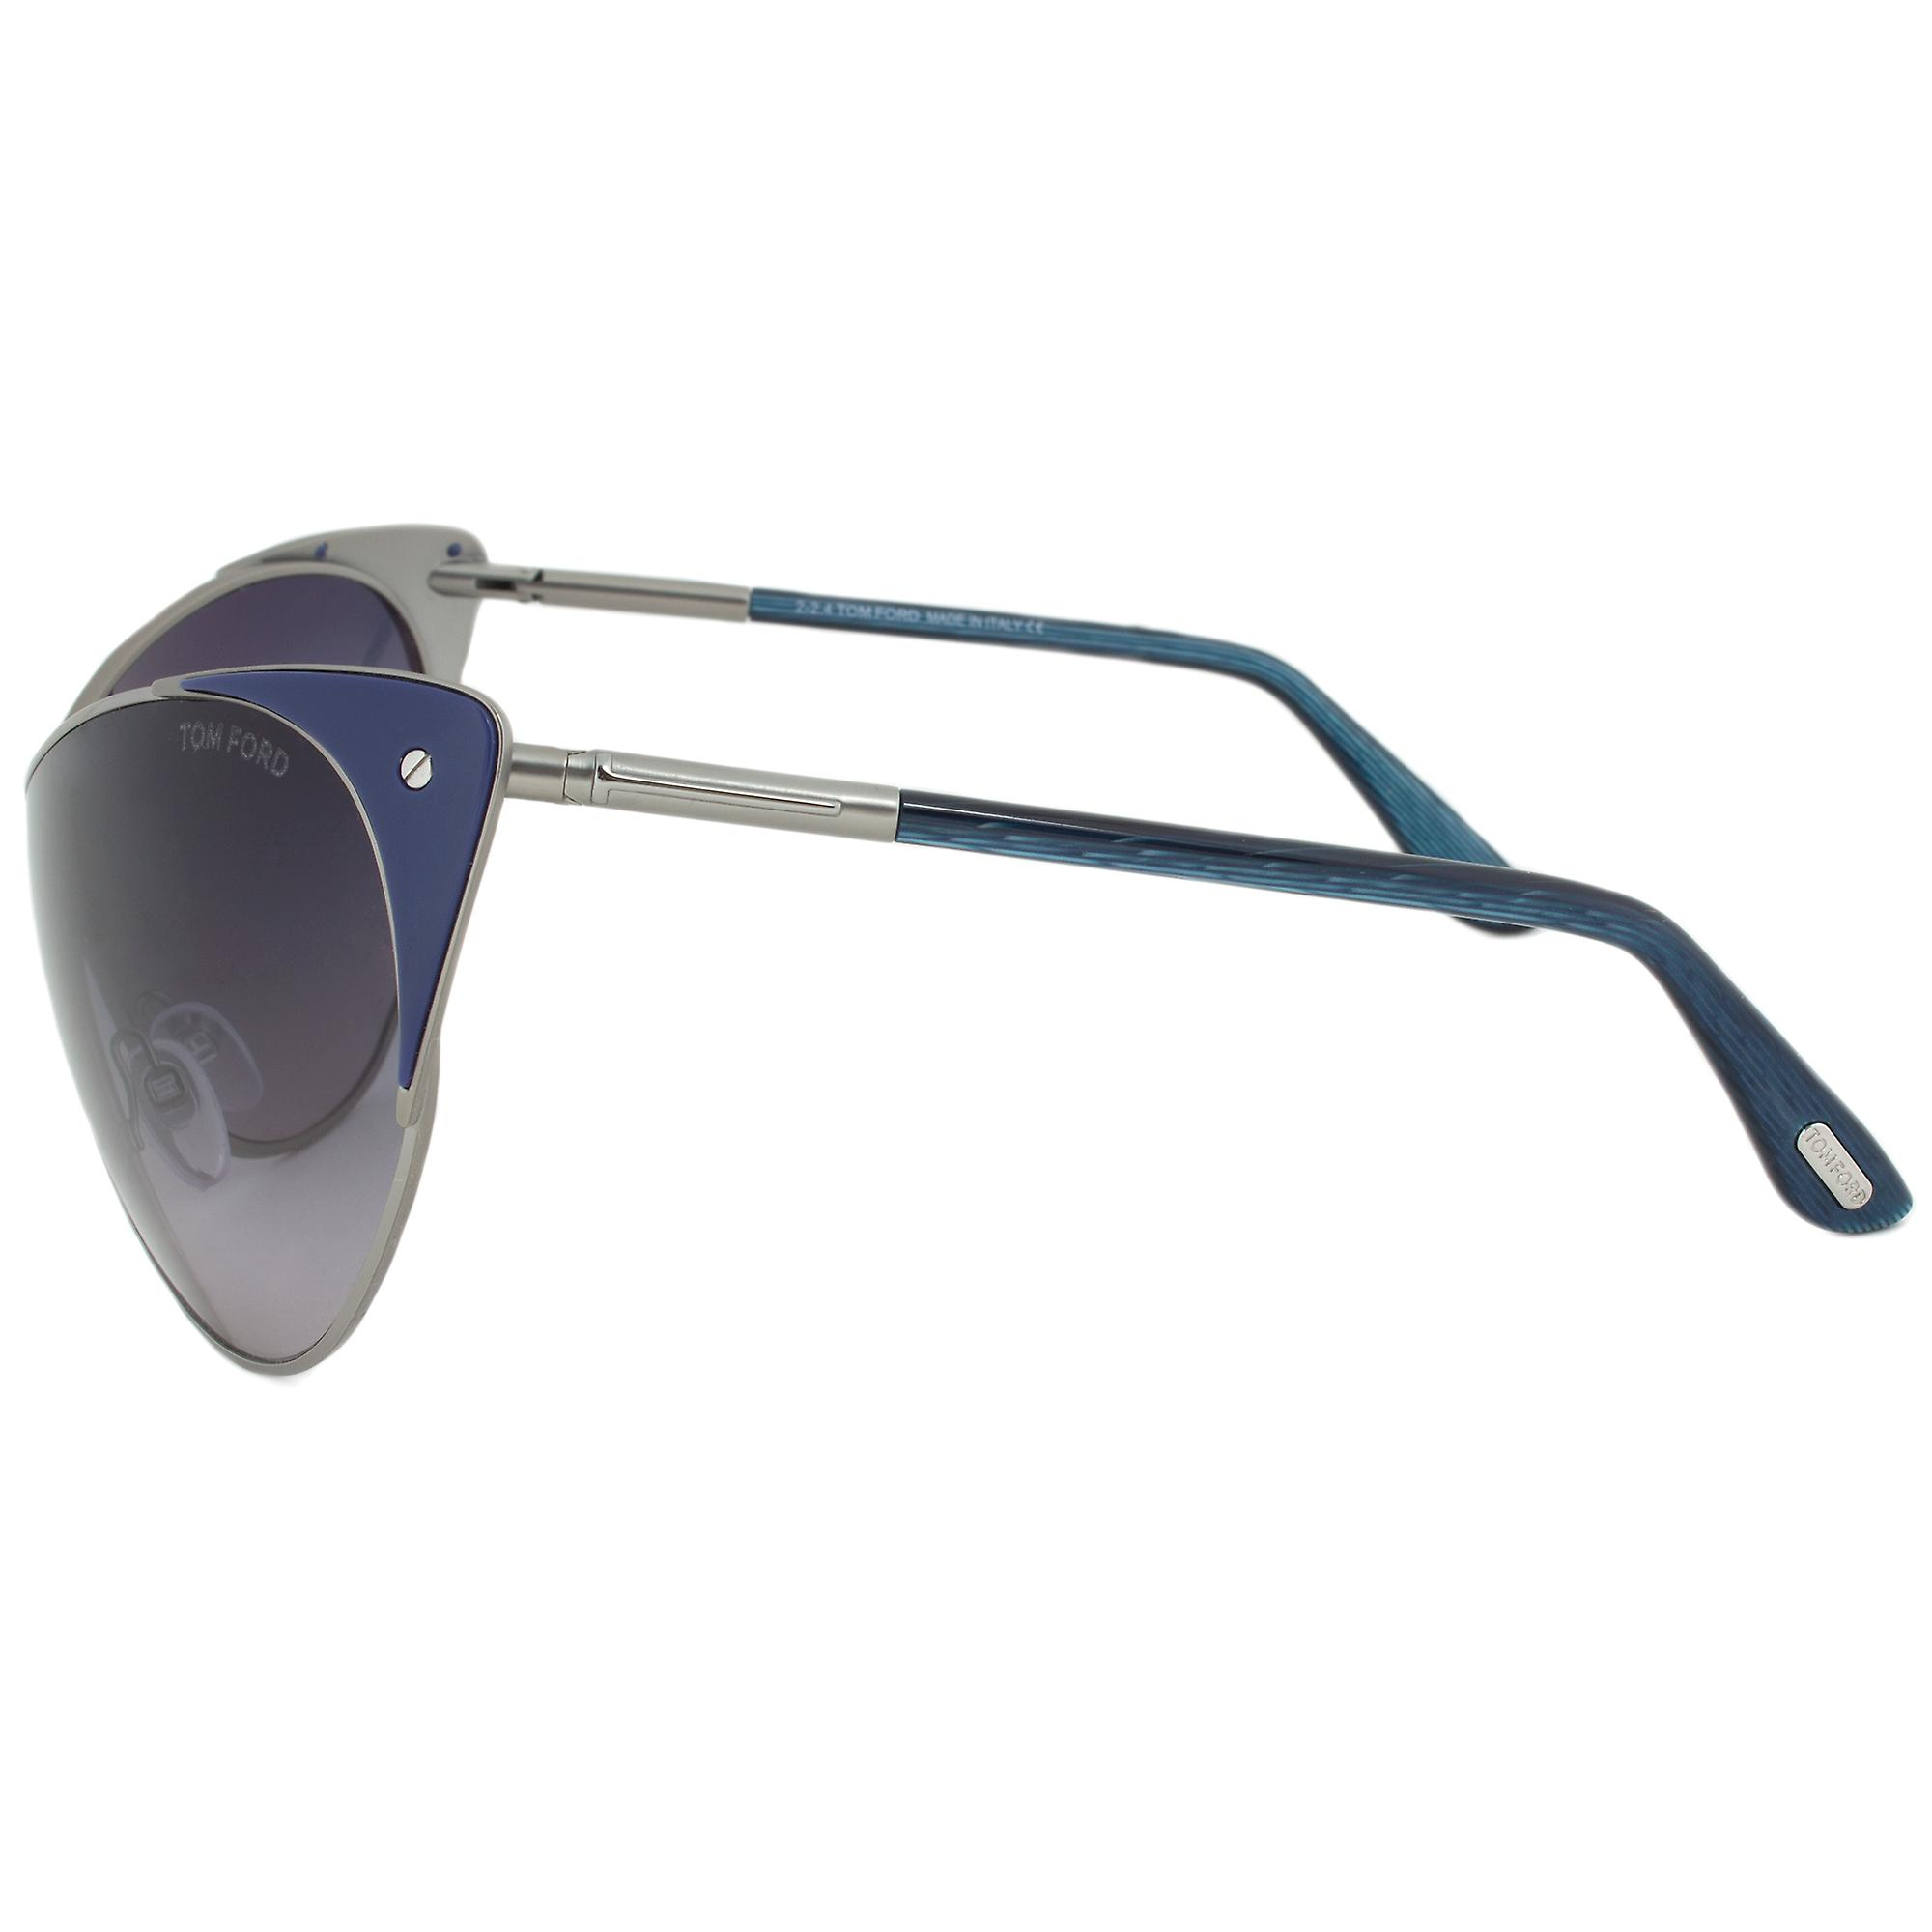 Tom Ford Vanda Cateye Sunglasses FT0364 89W | Gunmetal and Indigo Frame | Grey Gradient Lens